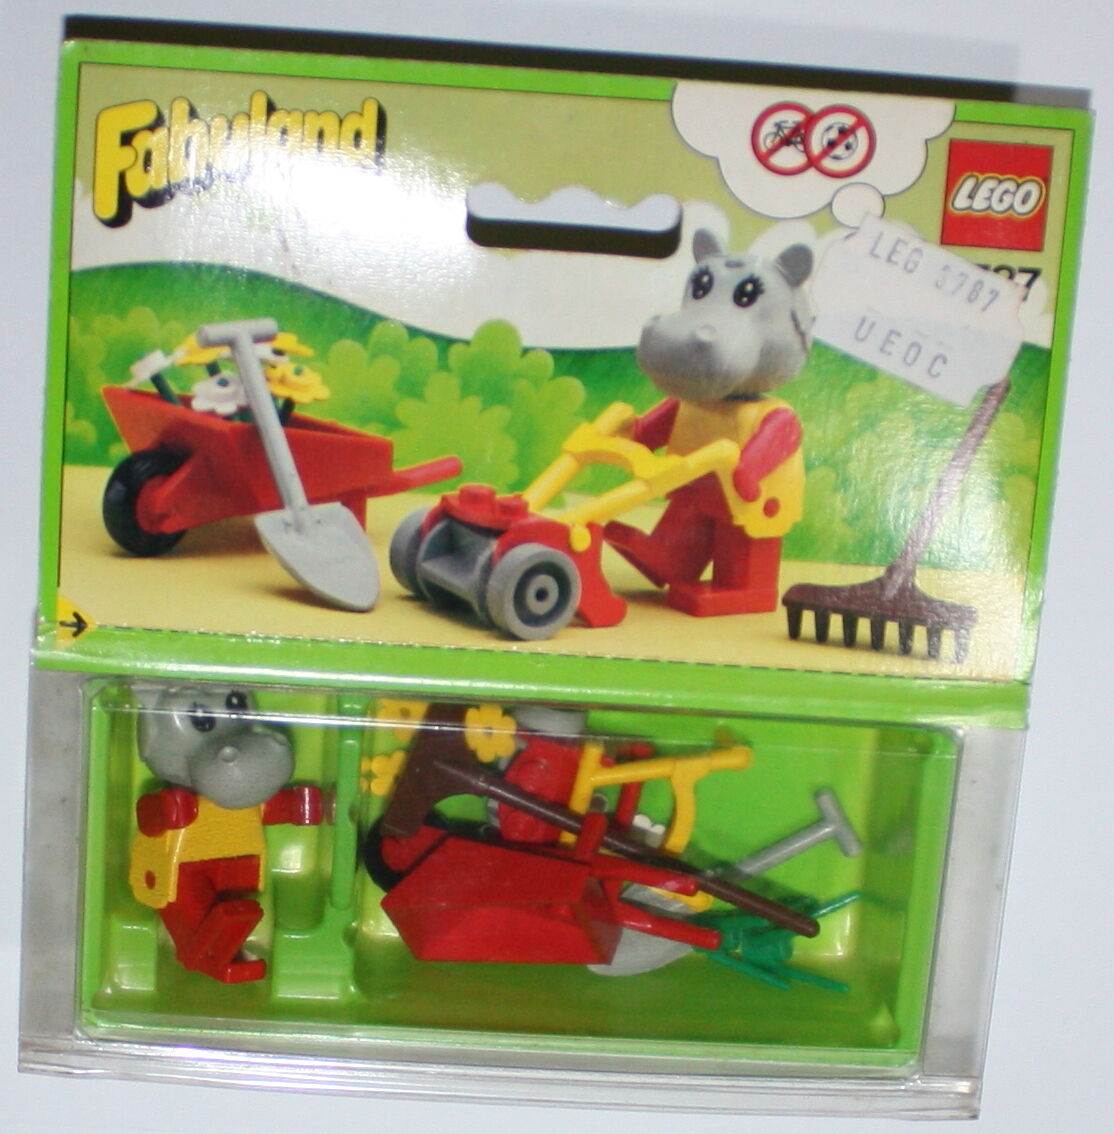 FABULAND LEGO 3787 HANNAH HIPPOPOTAMUS THE MASTER GARDEN COMPLETE SET in BOX